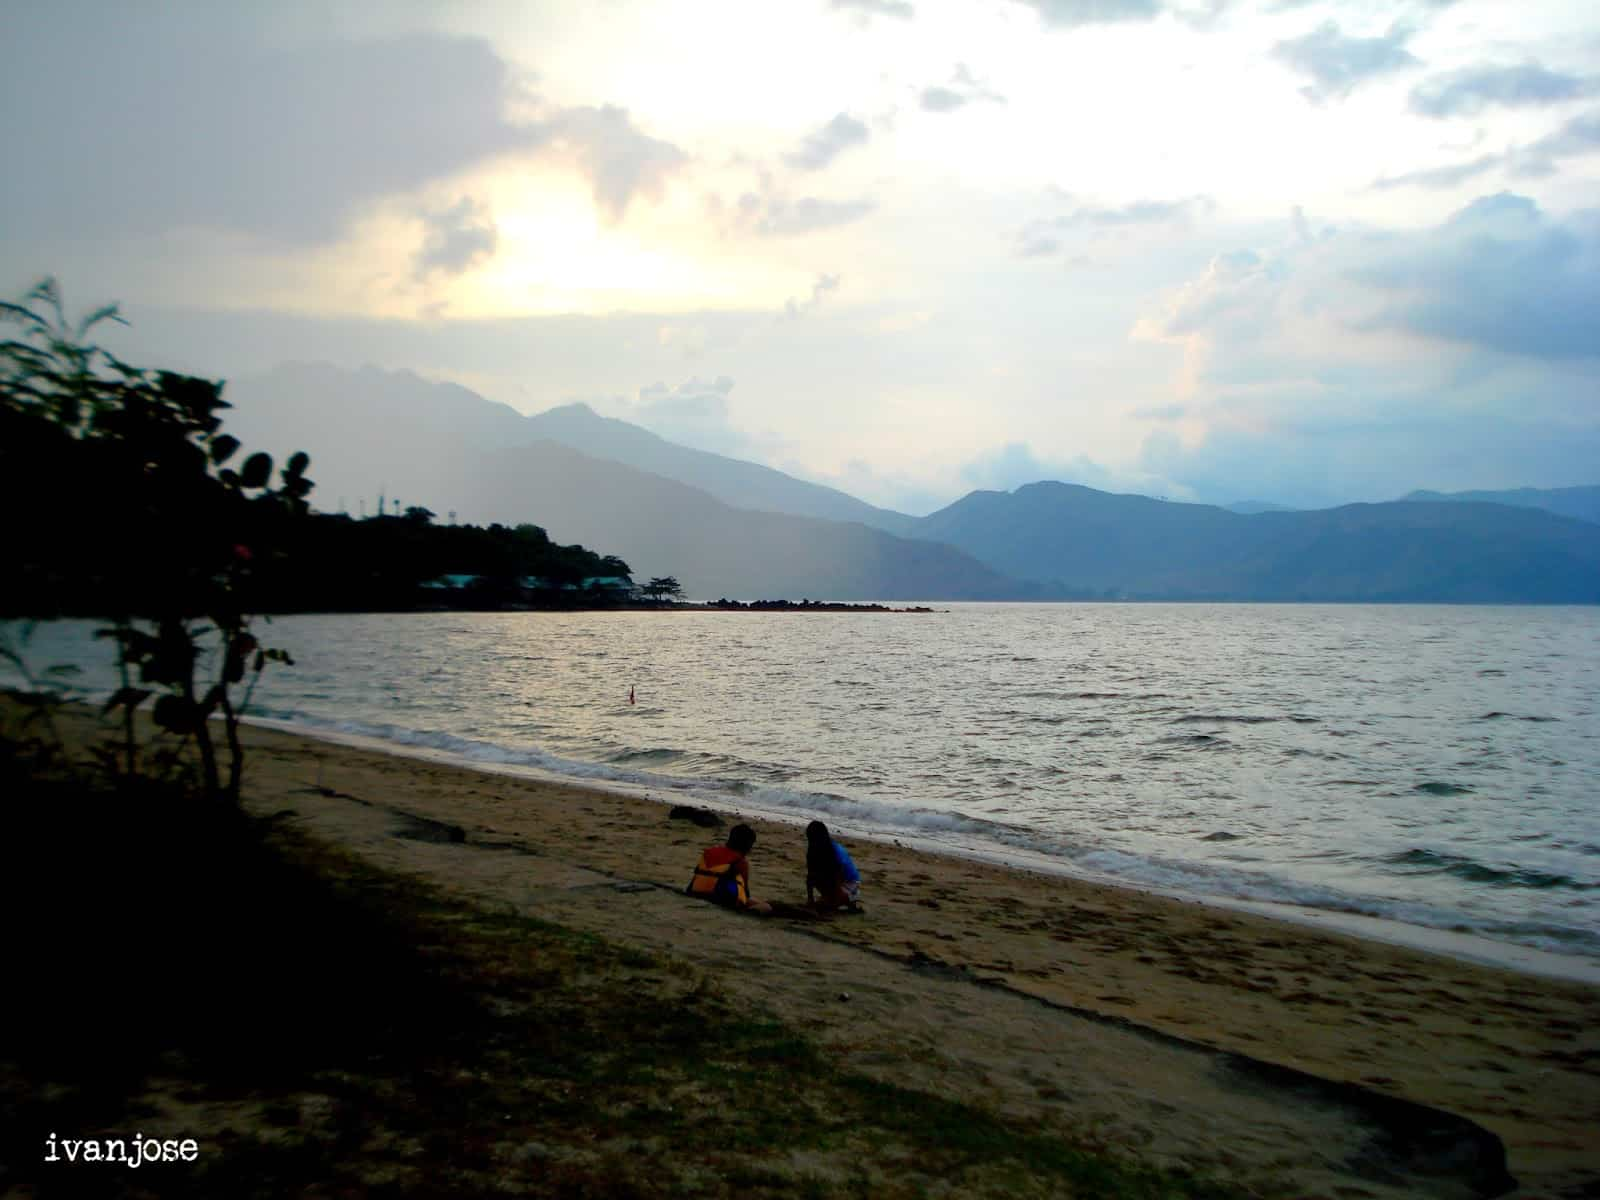 Shot of the beach during dusk at Grande Island Resort